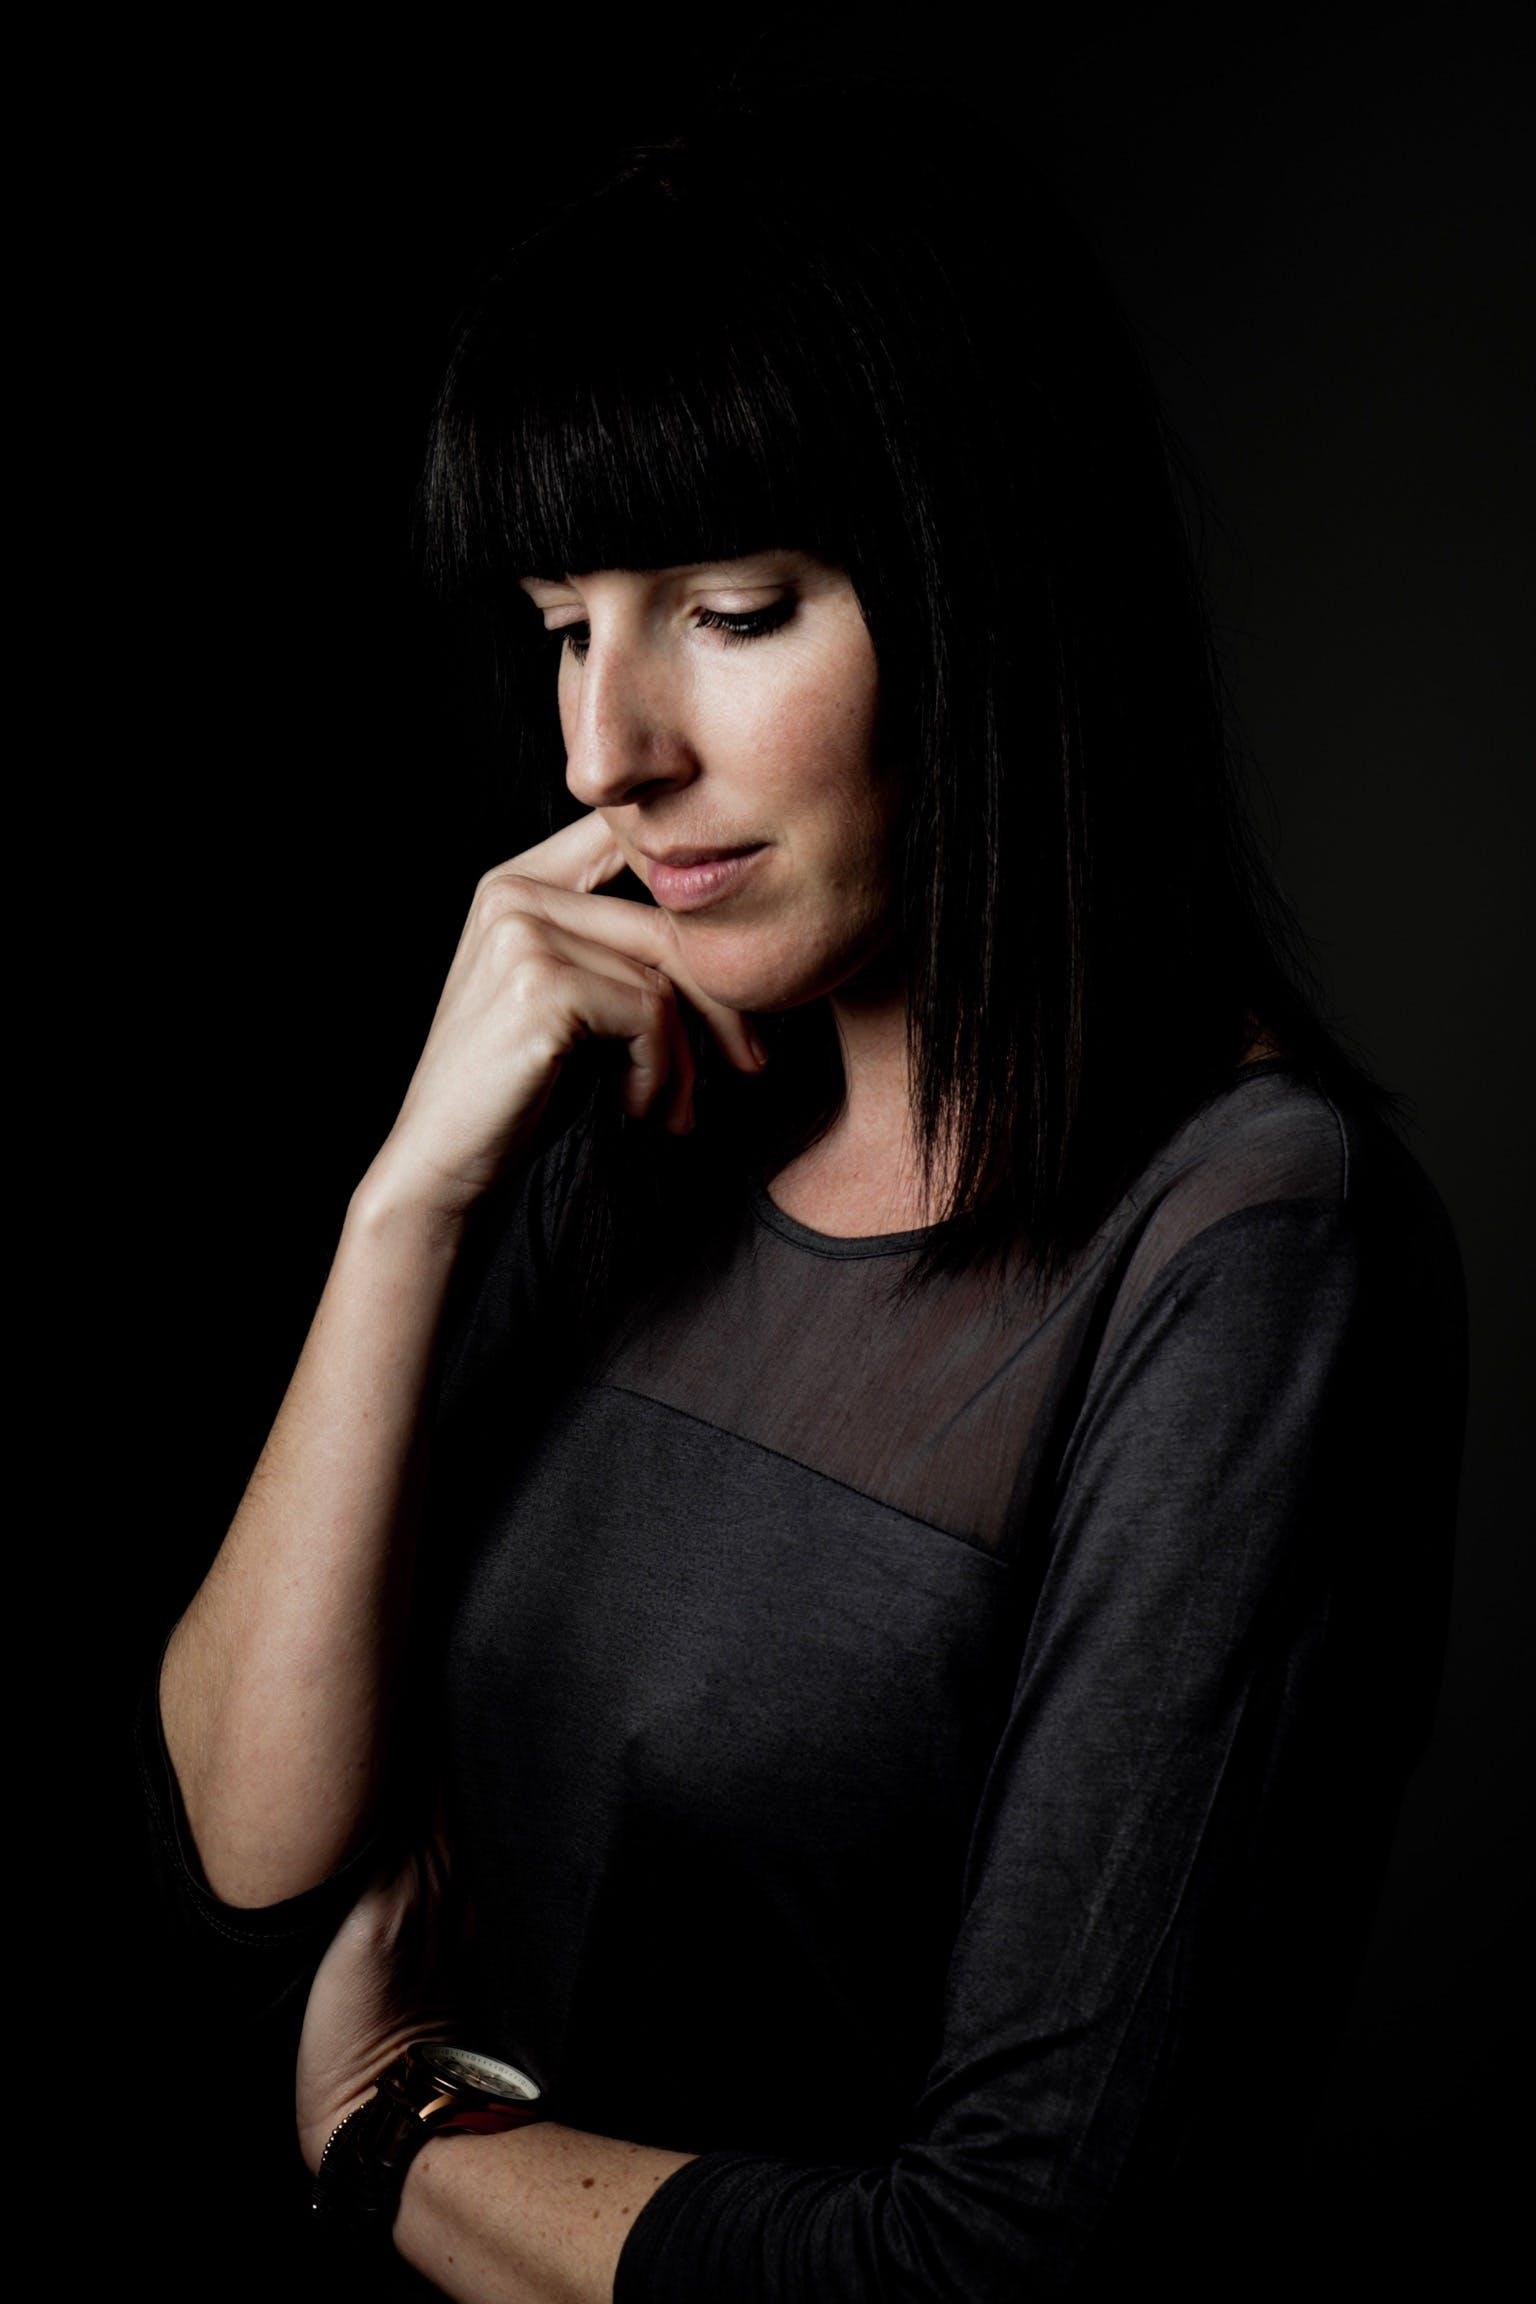 Free stock photo of beauty shooting, black background, canon, dark hair